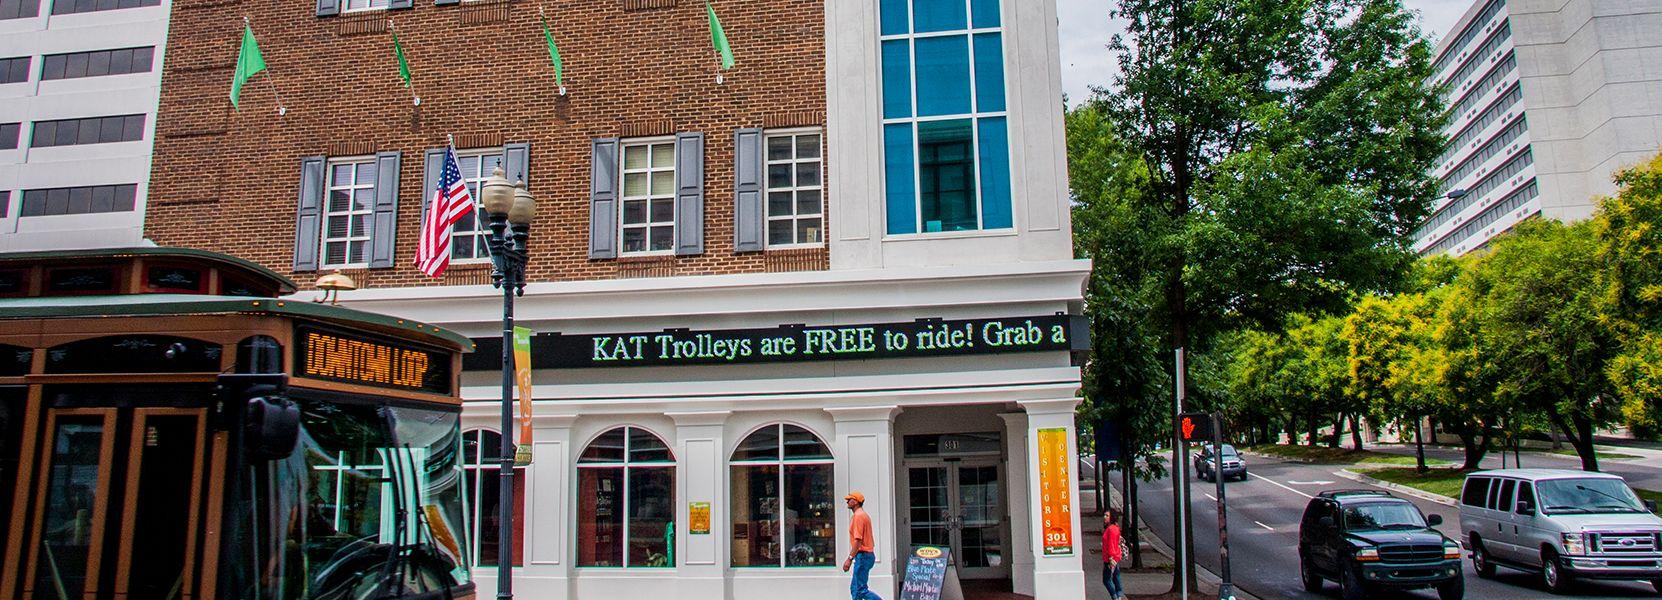 from Ayaan 800 s gay street knoxville zipcode